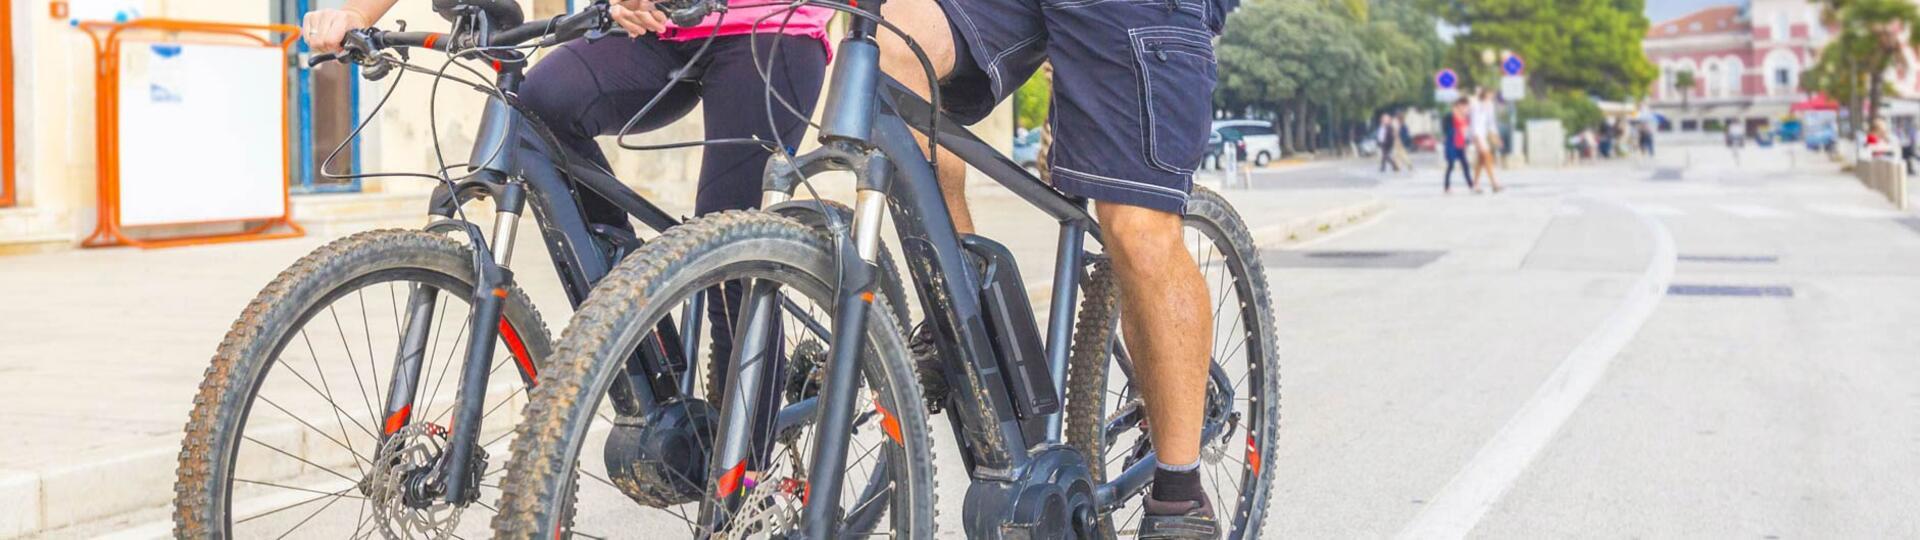 cycling.oxygenhotel it e-bike-rimini 014